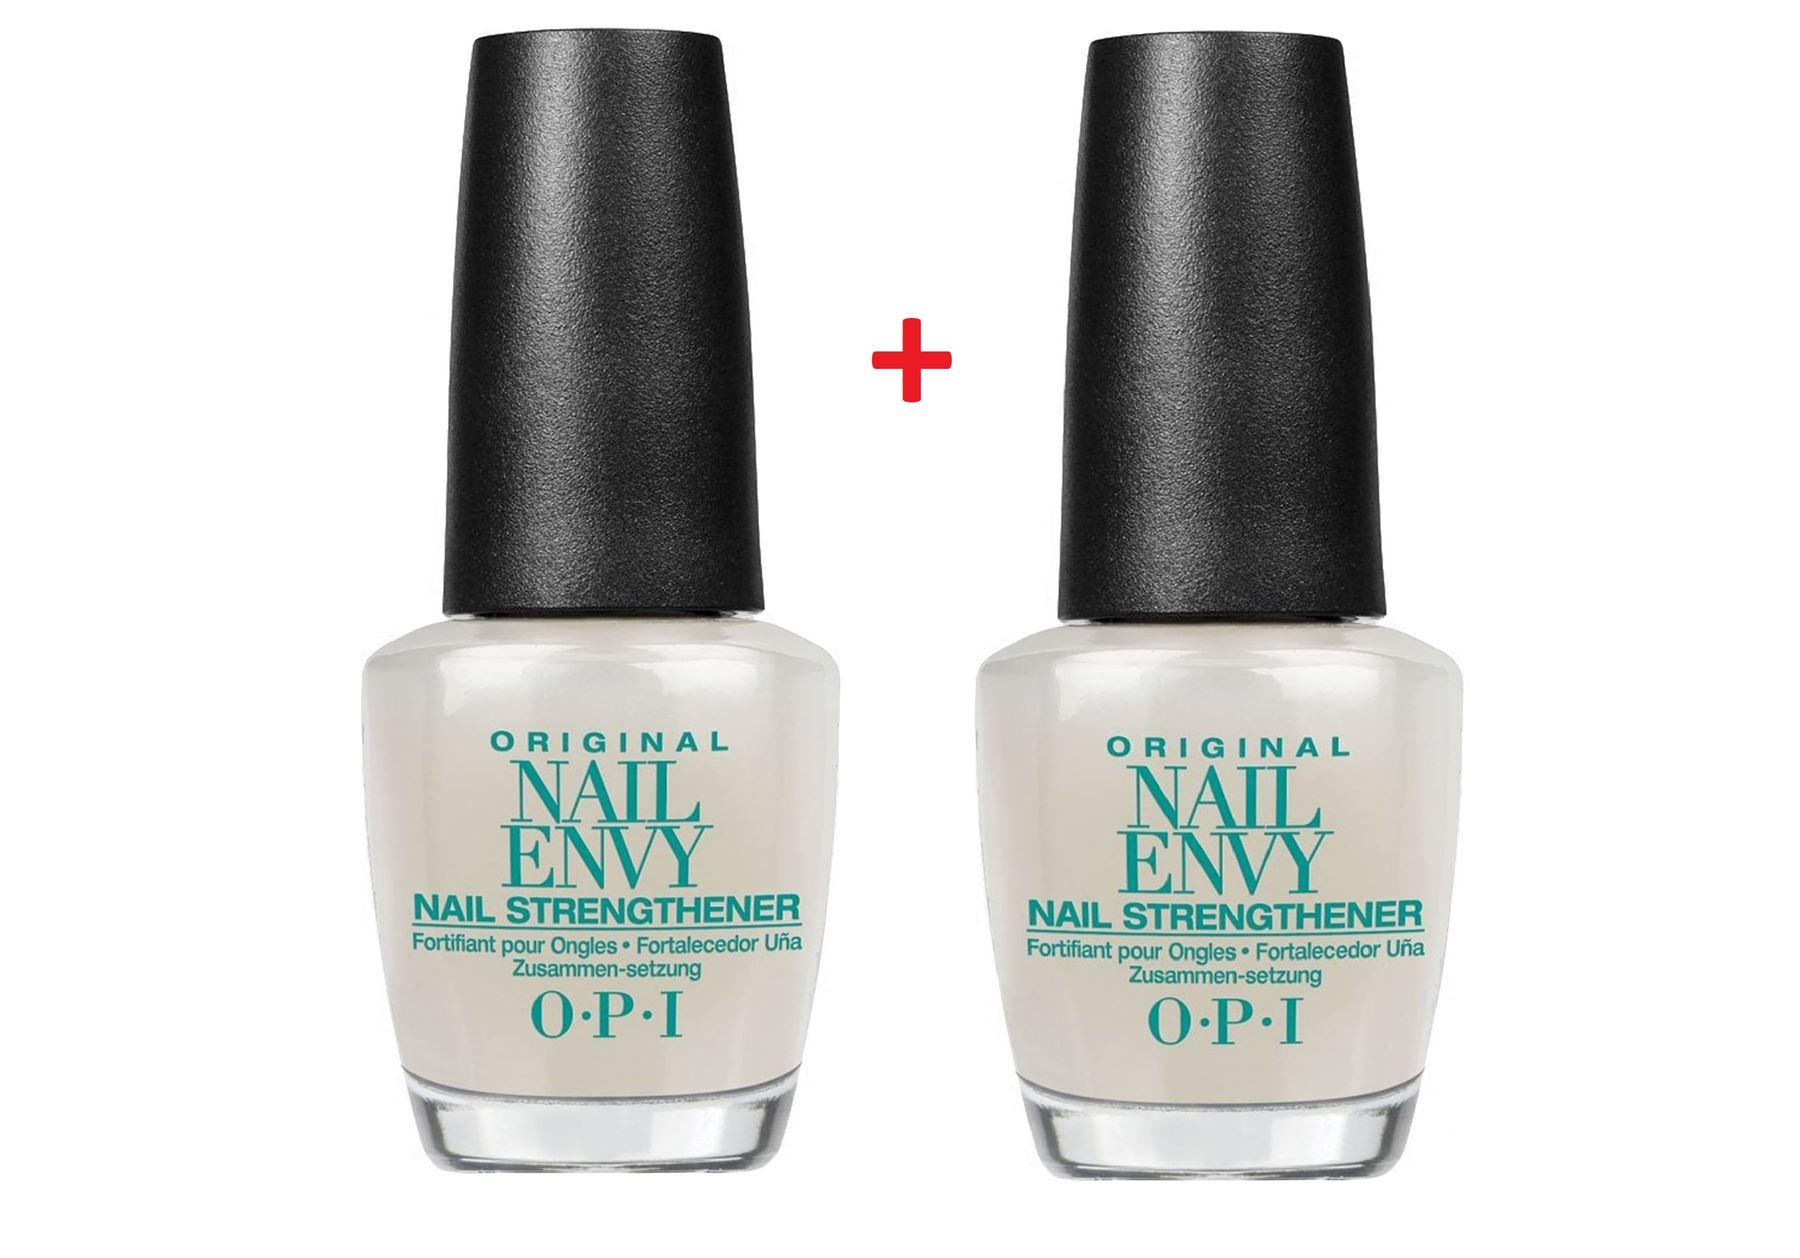 OPI Treatment MINI Original Nail Envy 3.75ml | Mini Start To Finish ...